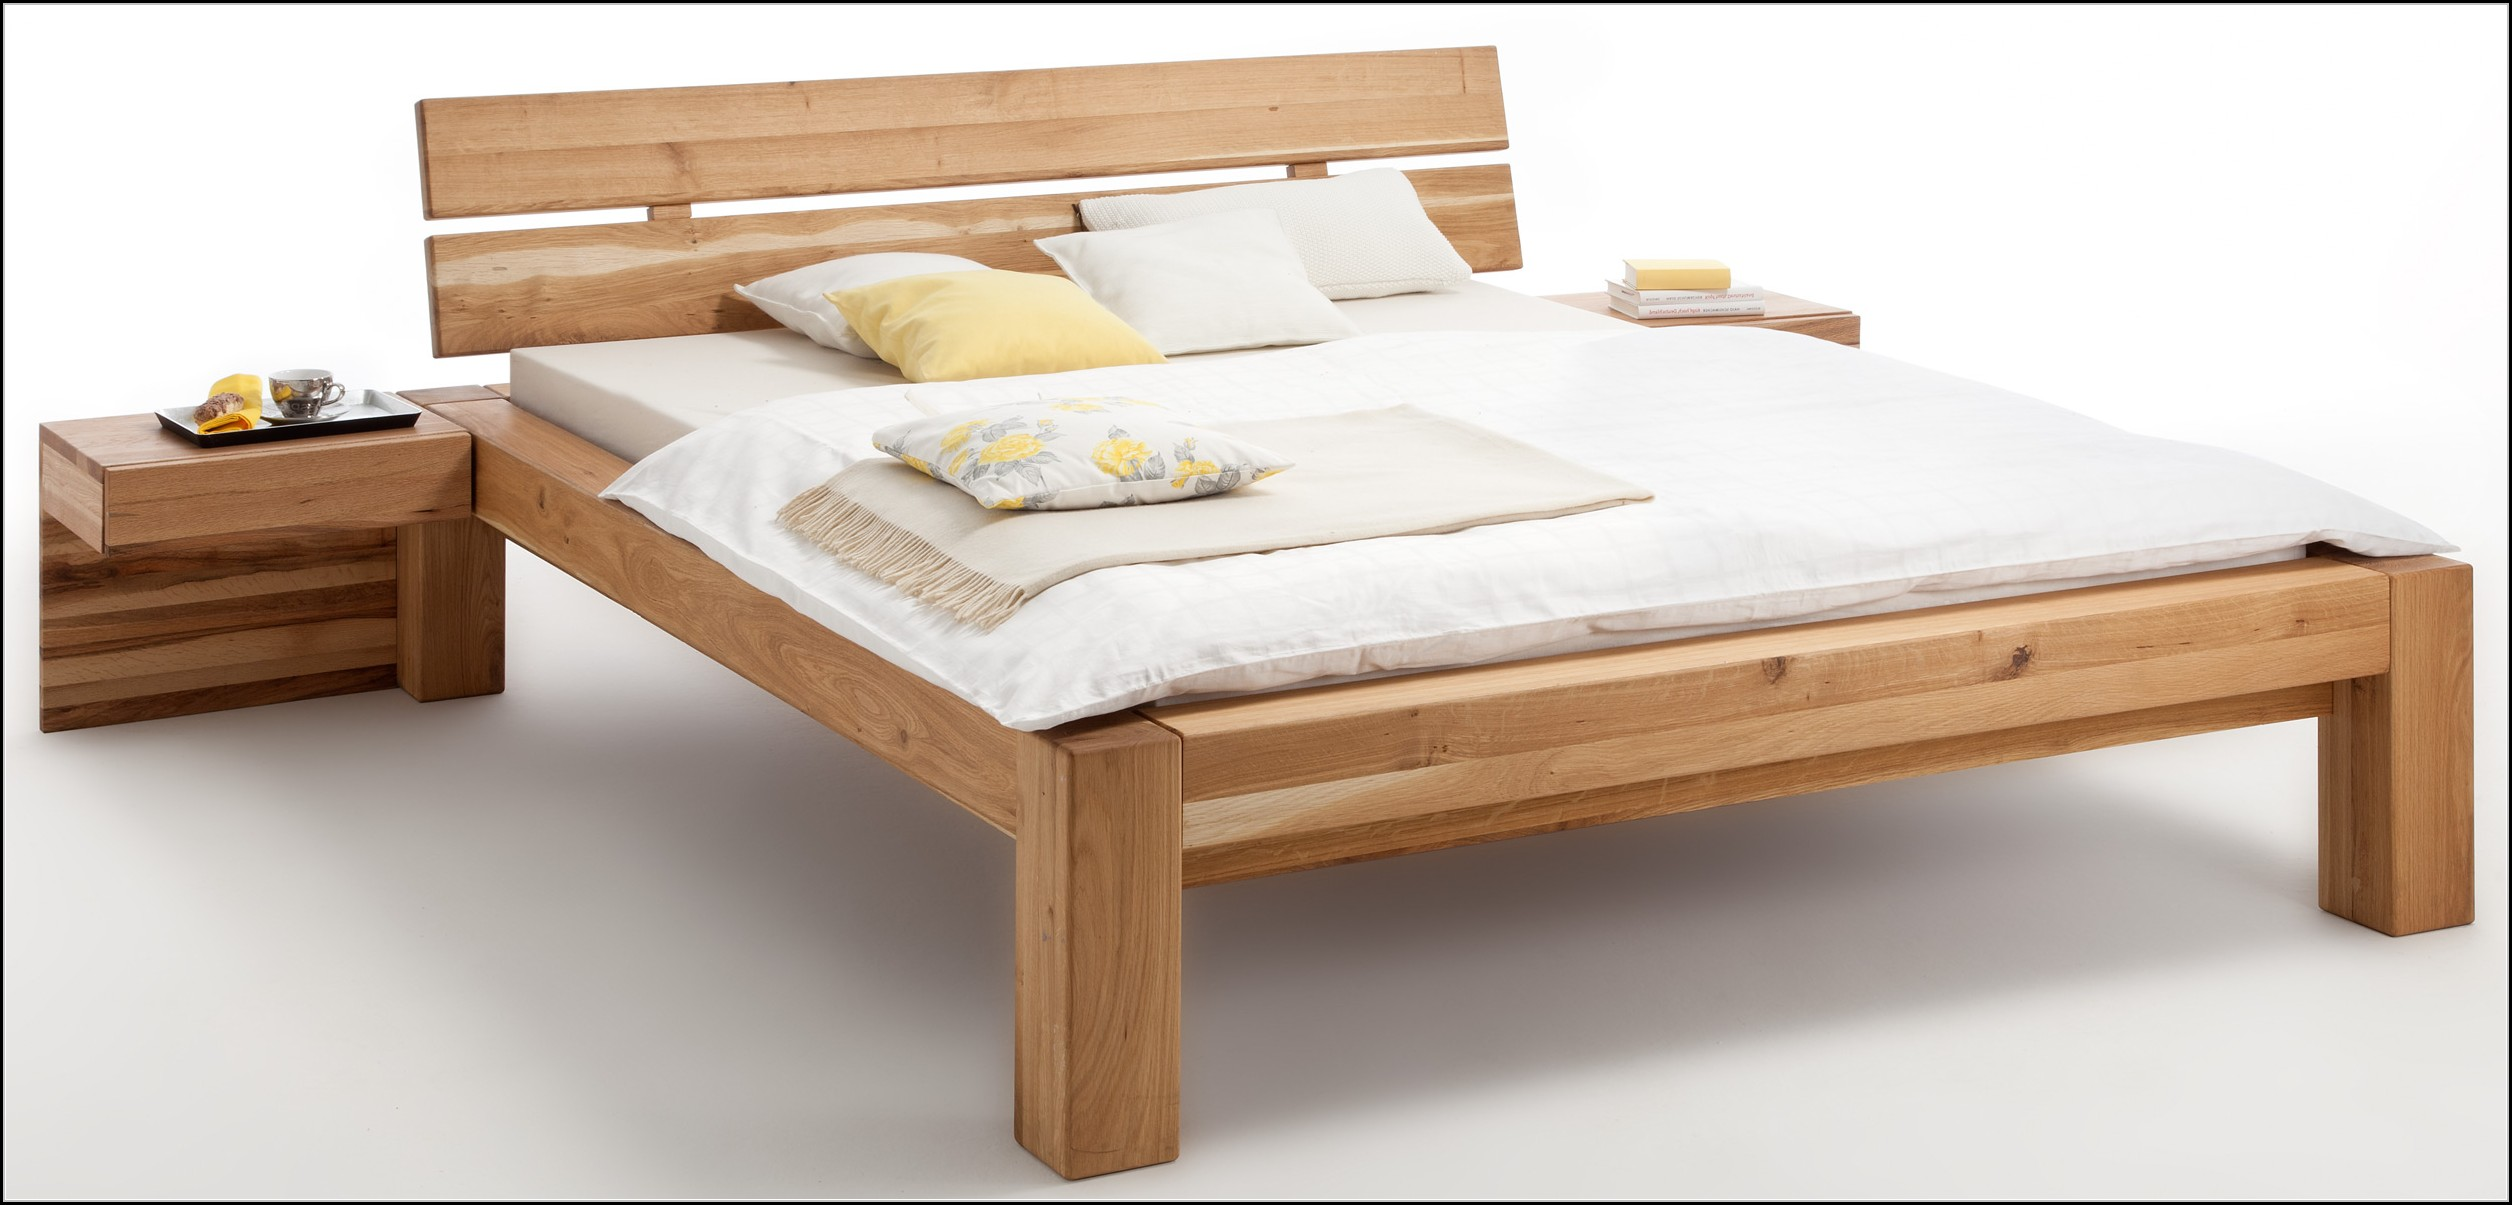 Bett 100x200 massivholz betten house und dekor galerie for Bett 100x200 massivholz